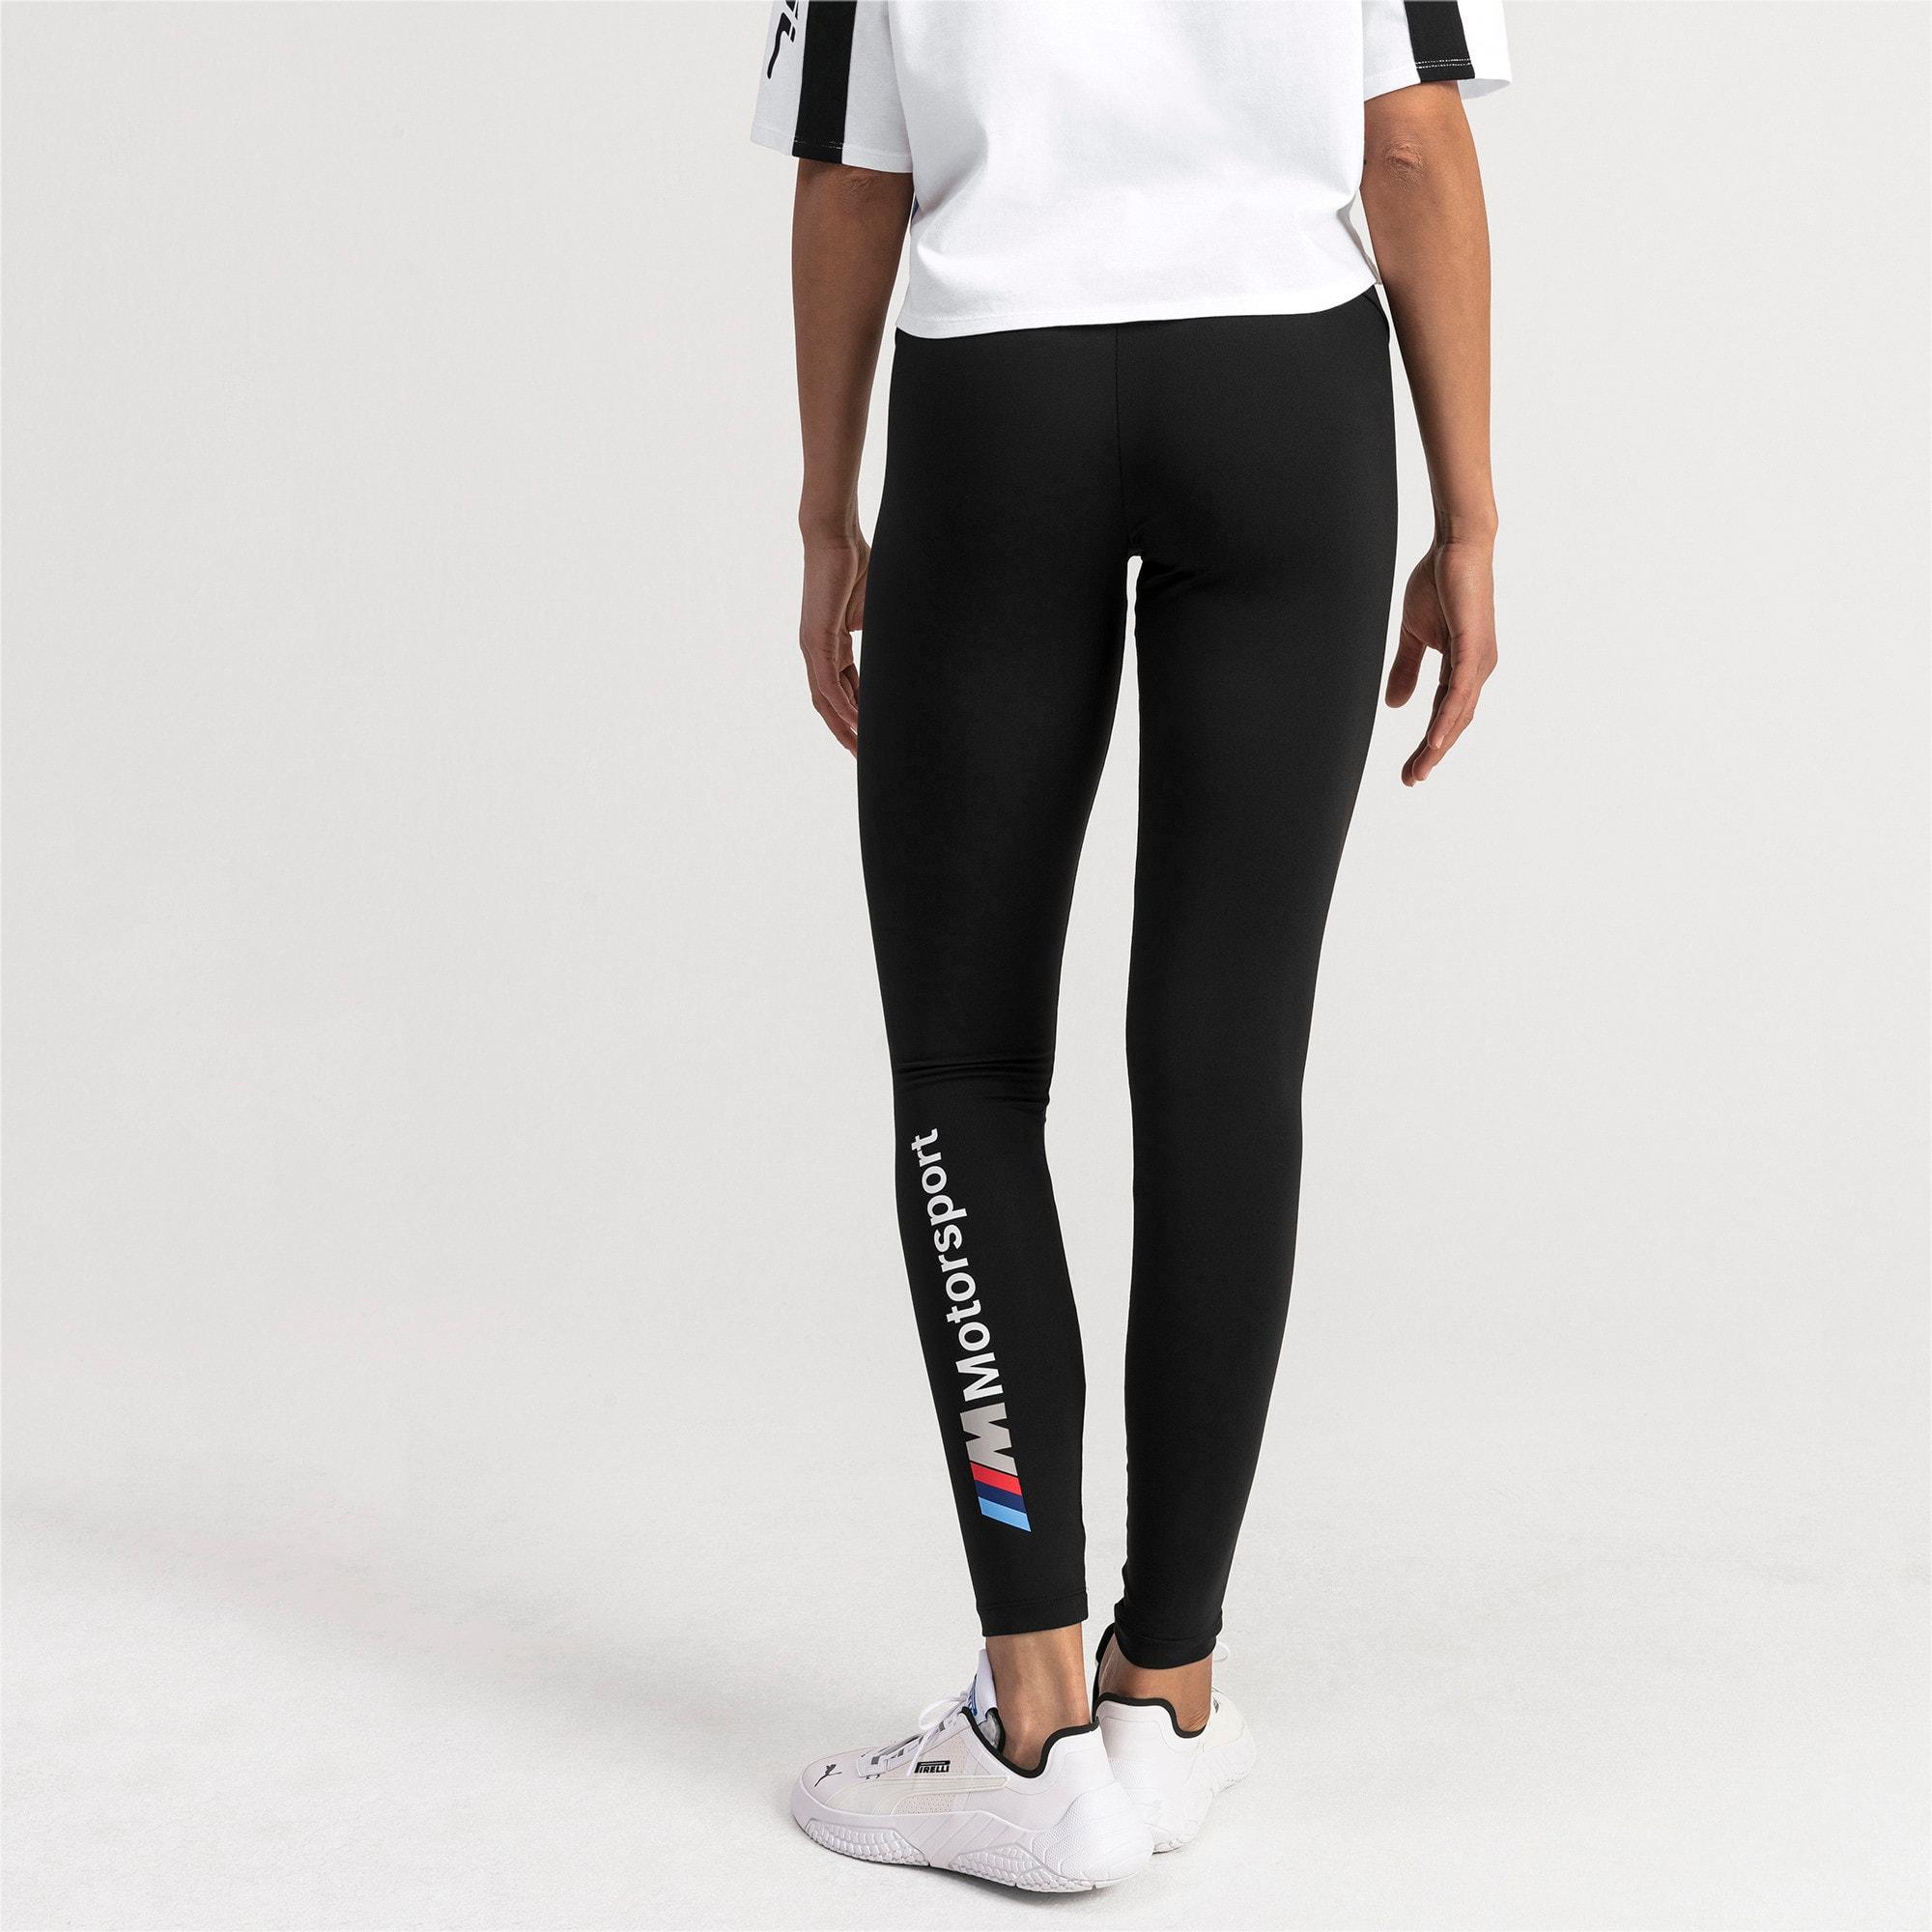 Thumbnail 2 of BMW M Motorsports Women's Leggings, Puma Black, medium